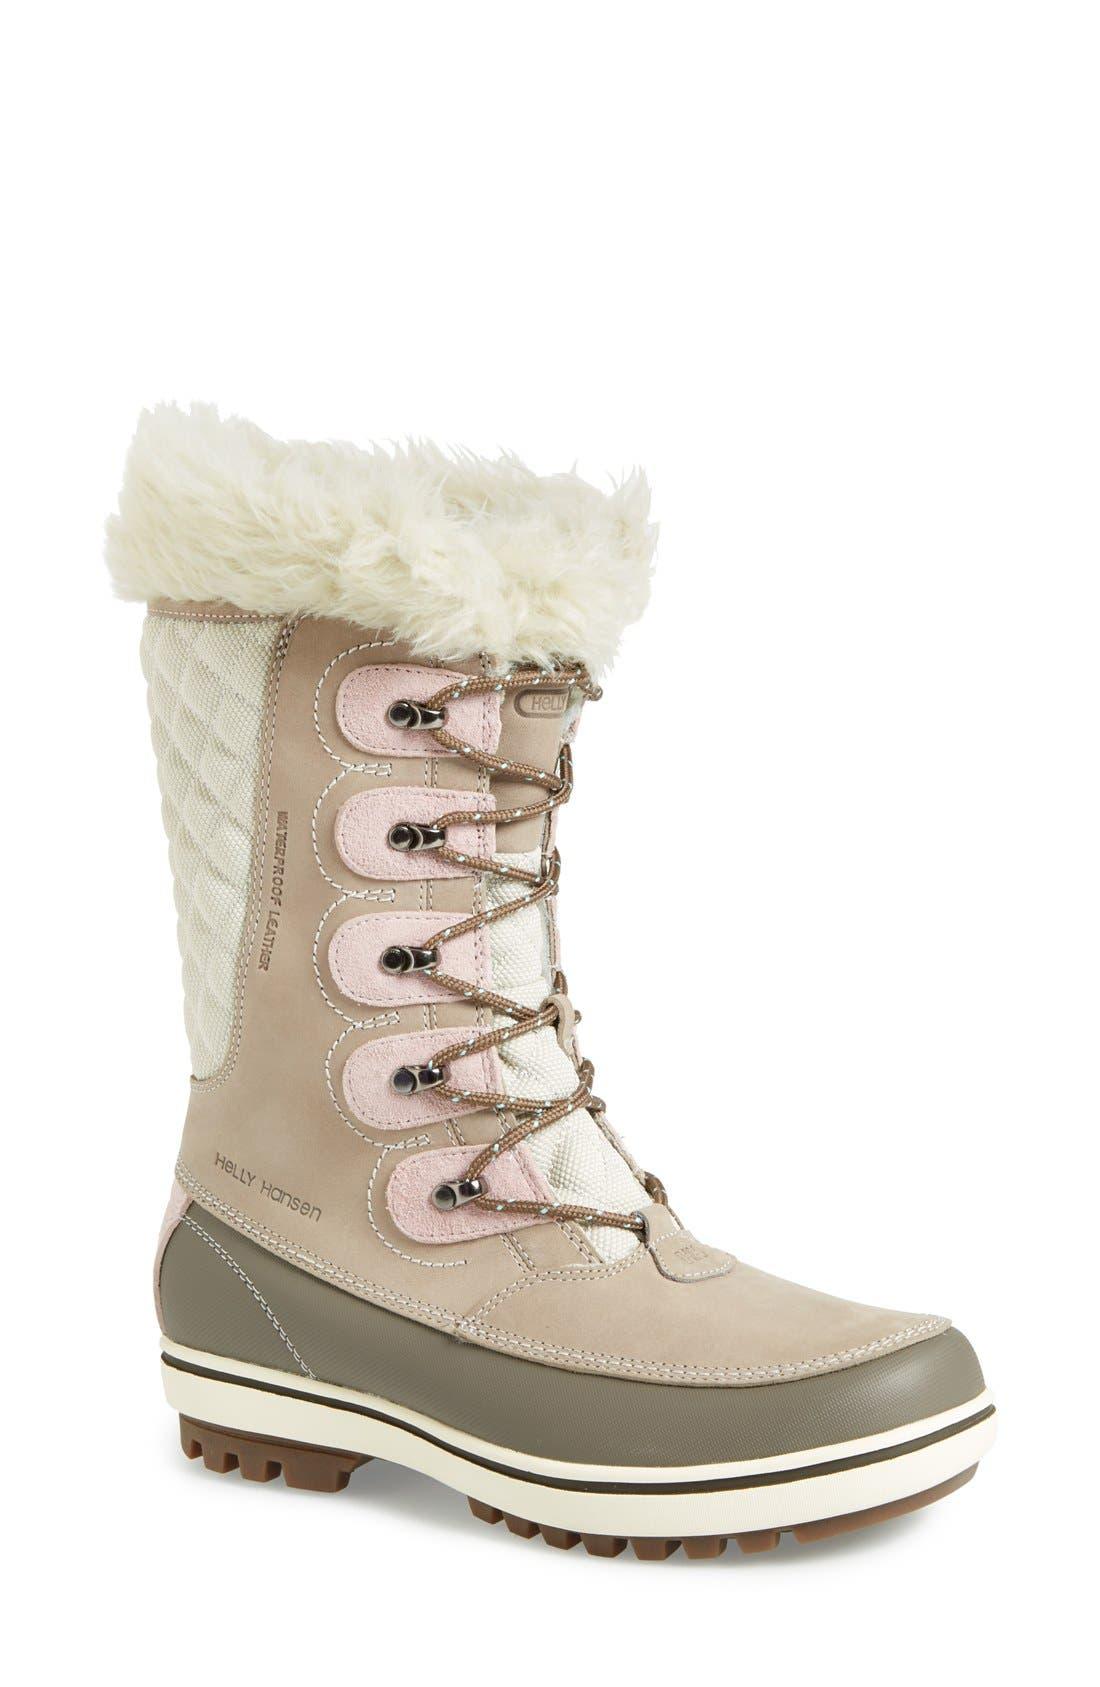 'Garibaldi' Waterproof Snow Boot,                             Main thumbnail 1, color,                             097